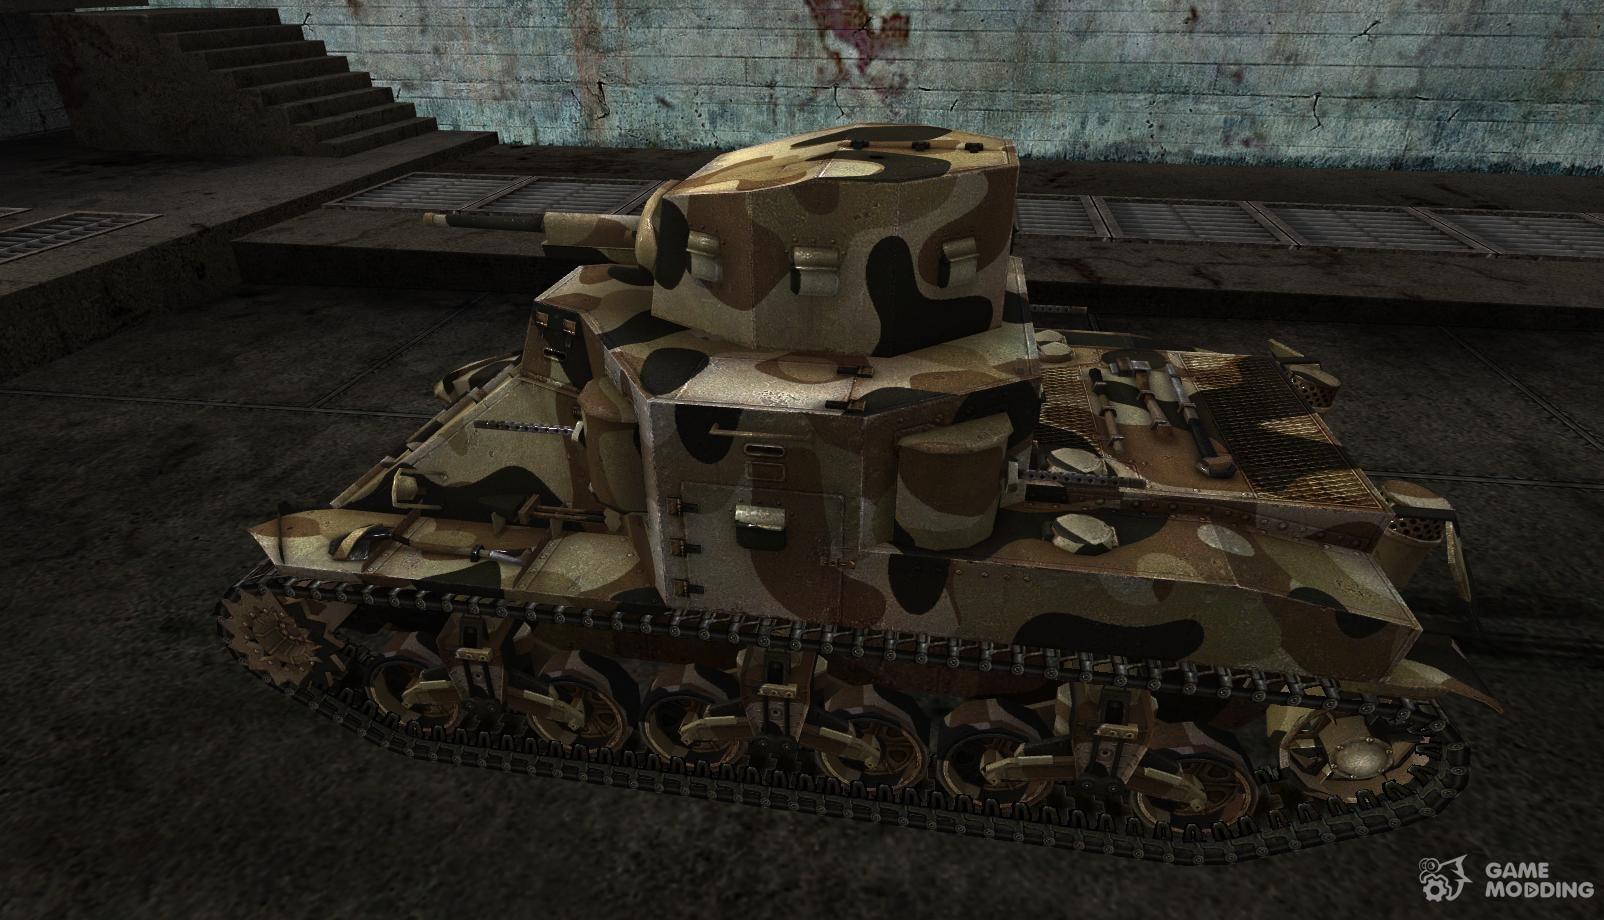 wot tank sound mod